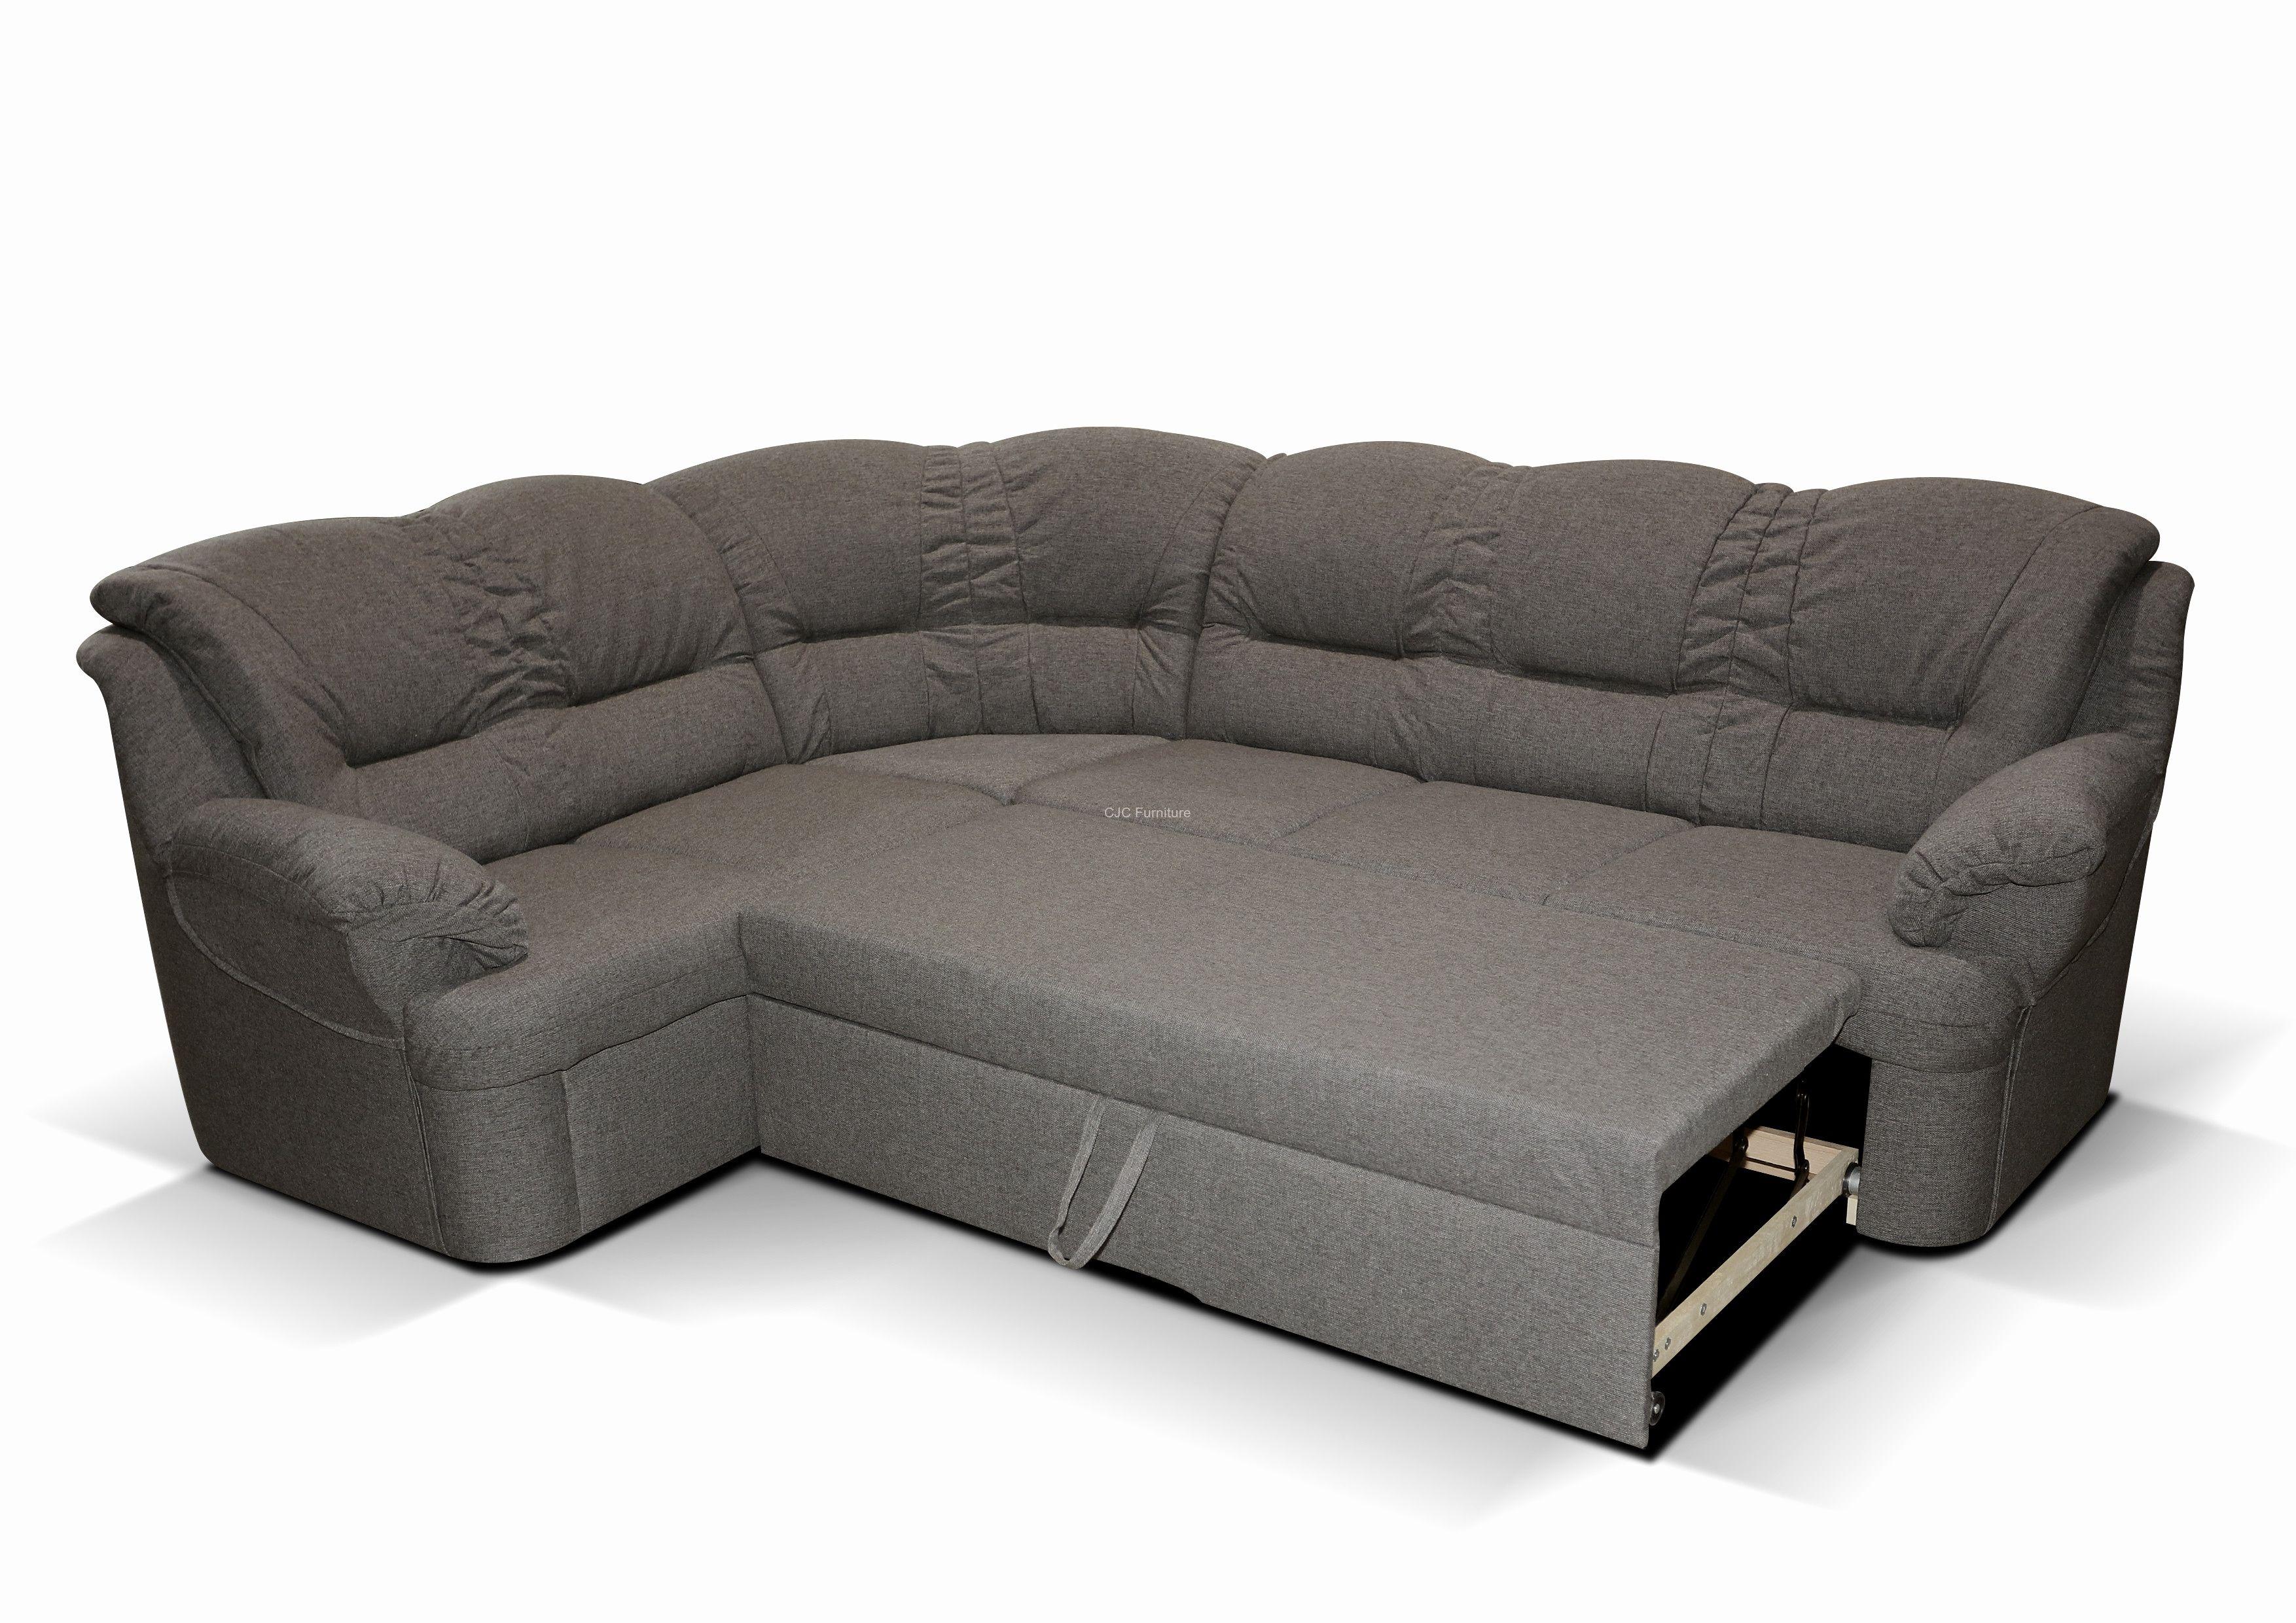 C Shaped Sofa Designs Wrought Iron Set In Pune Sofas Uk Free Shipping 2017 Latest House